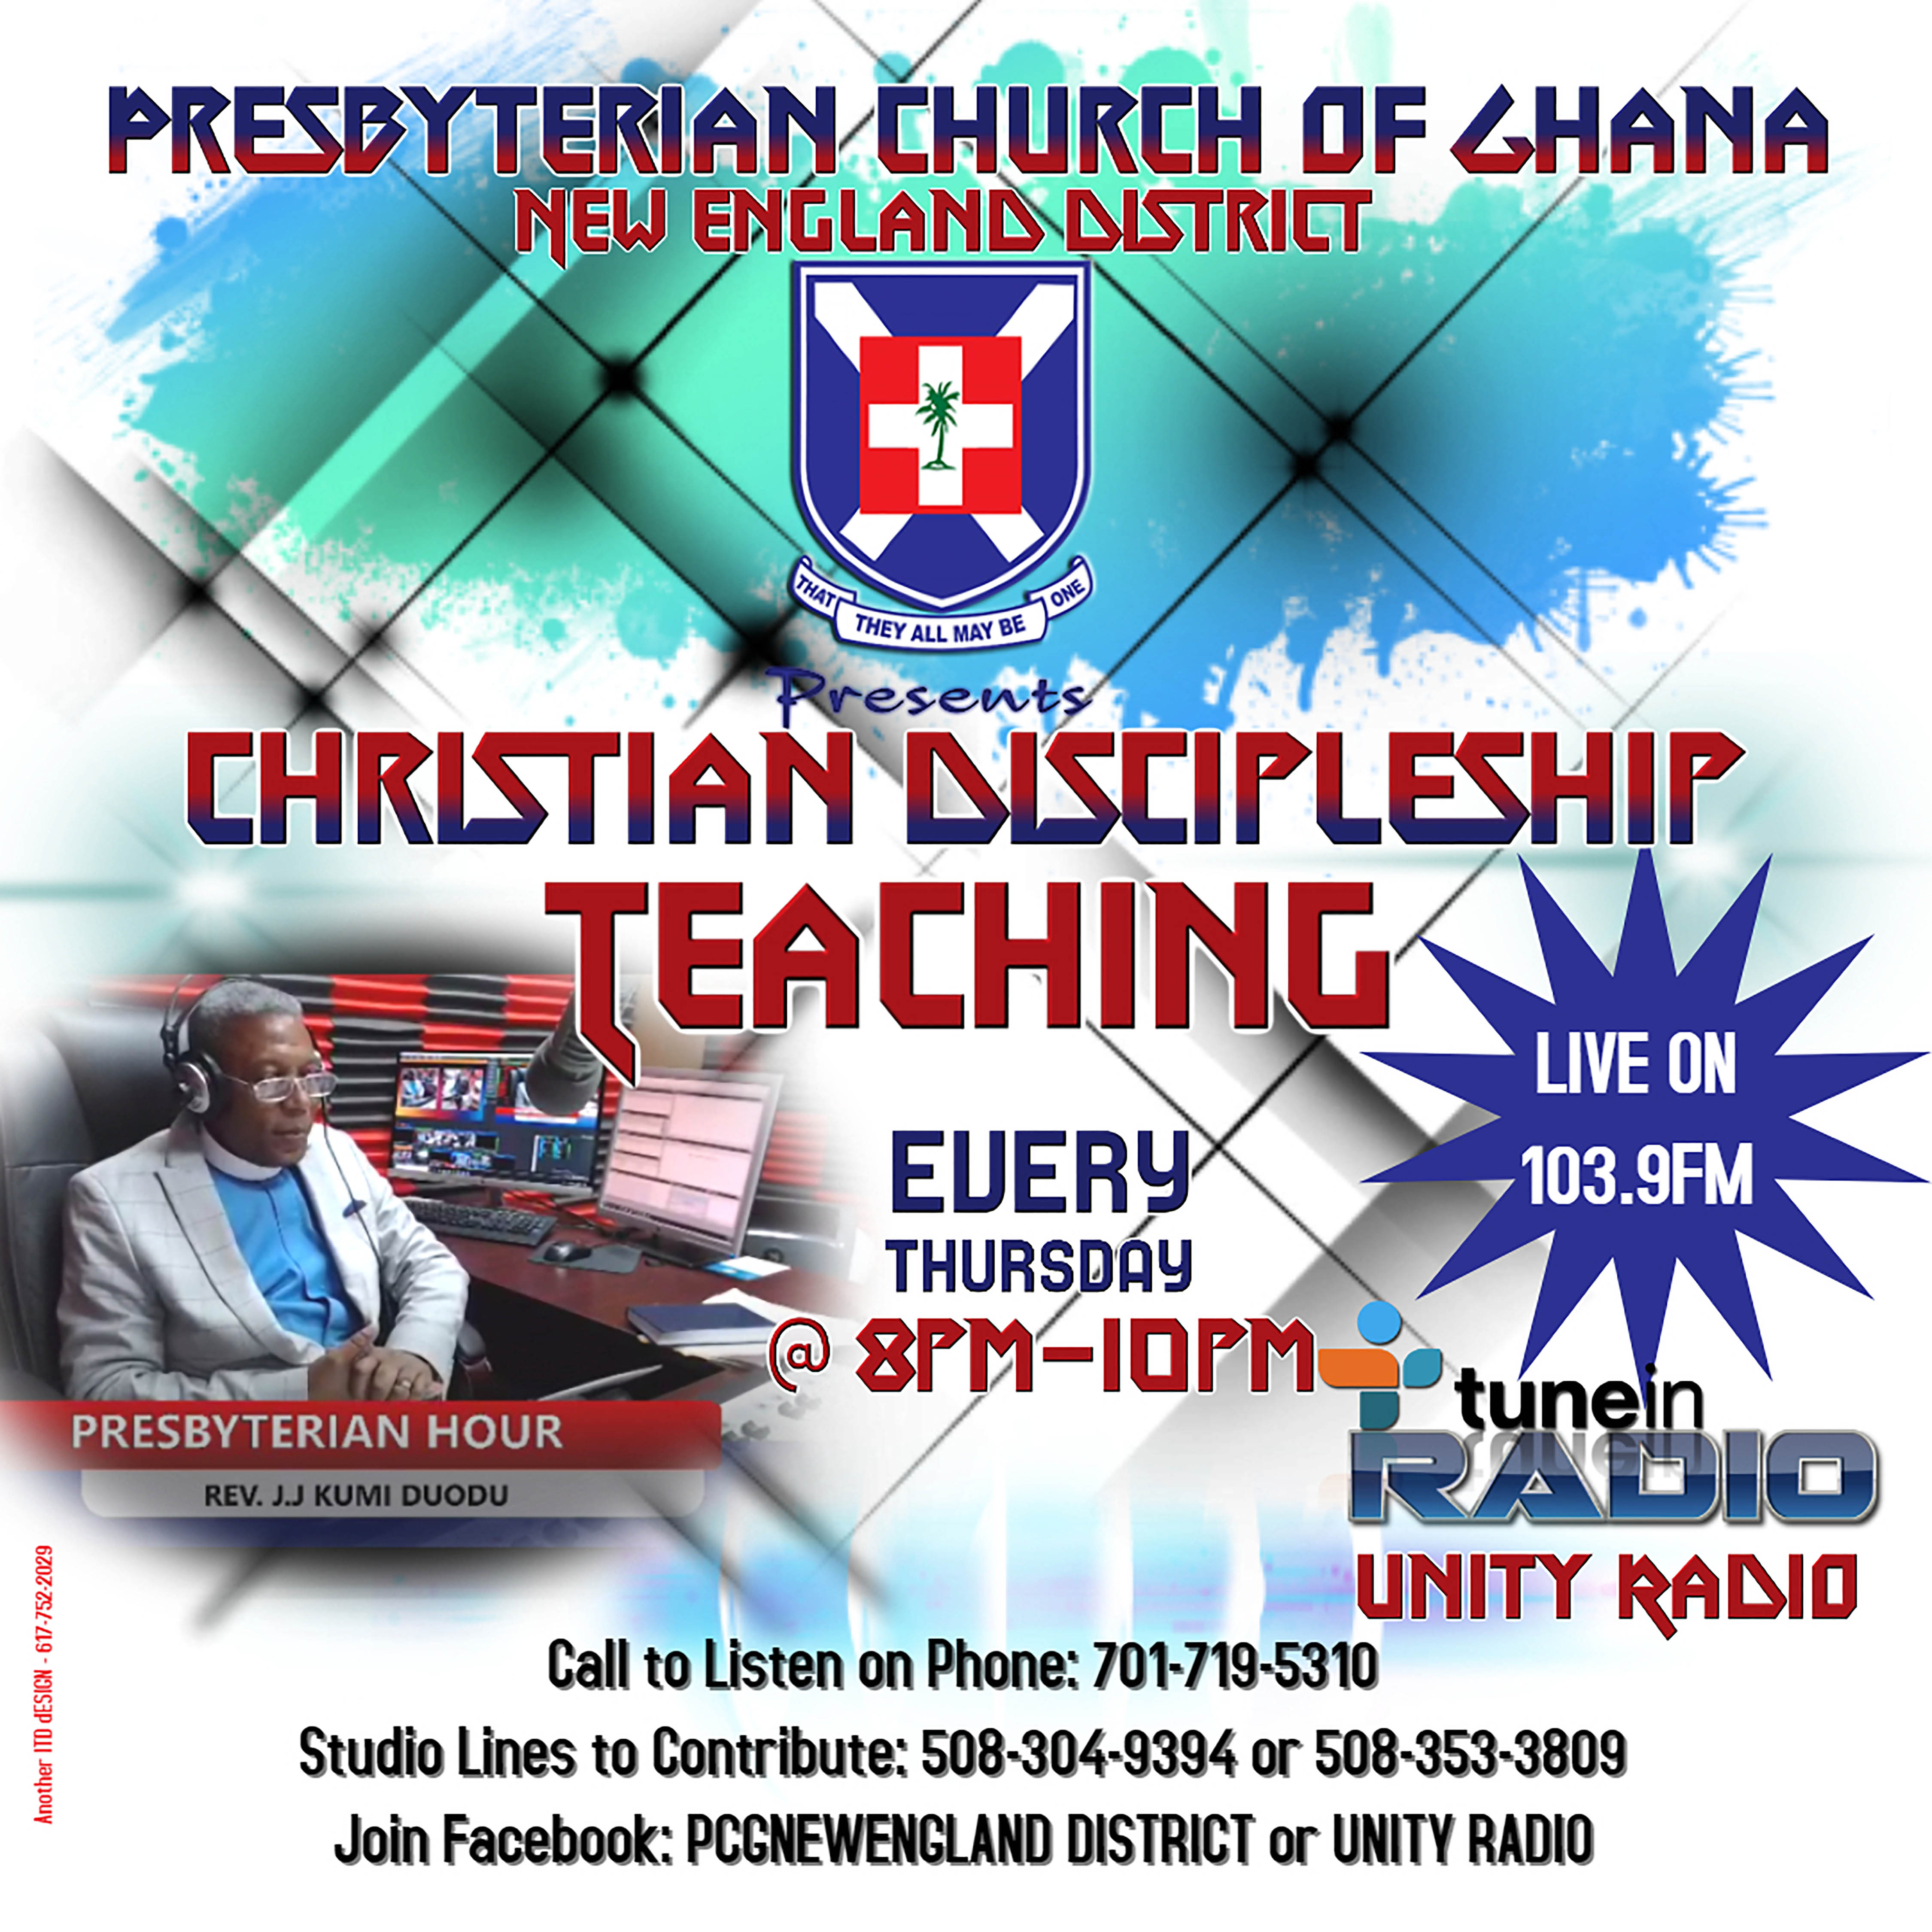 PRESBYTERIAN HOUR – CHRISTIAN DISCIPLESHIP TEACHING